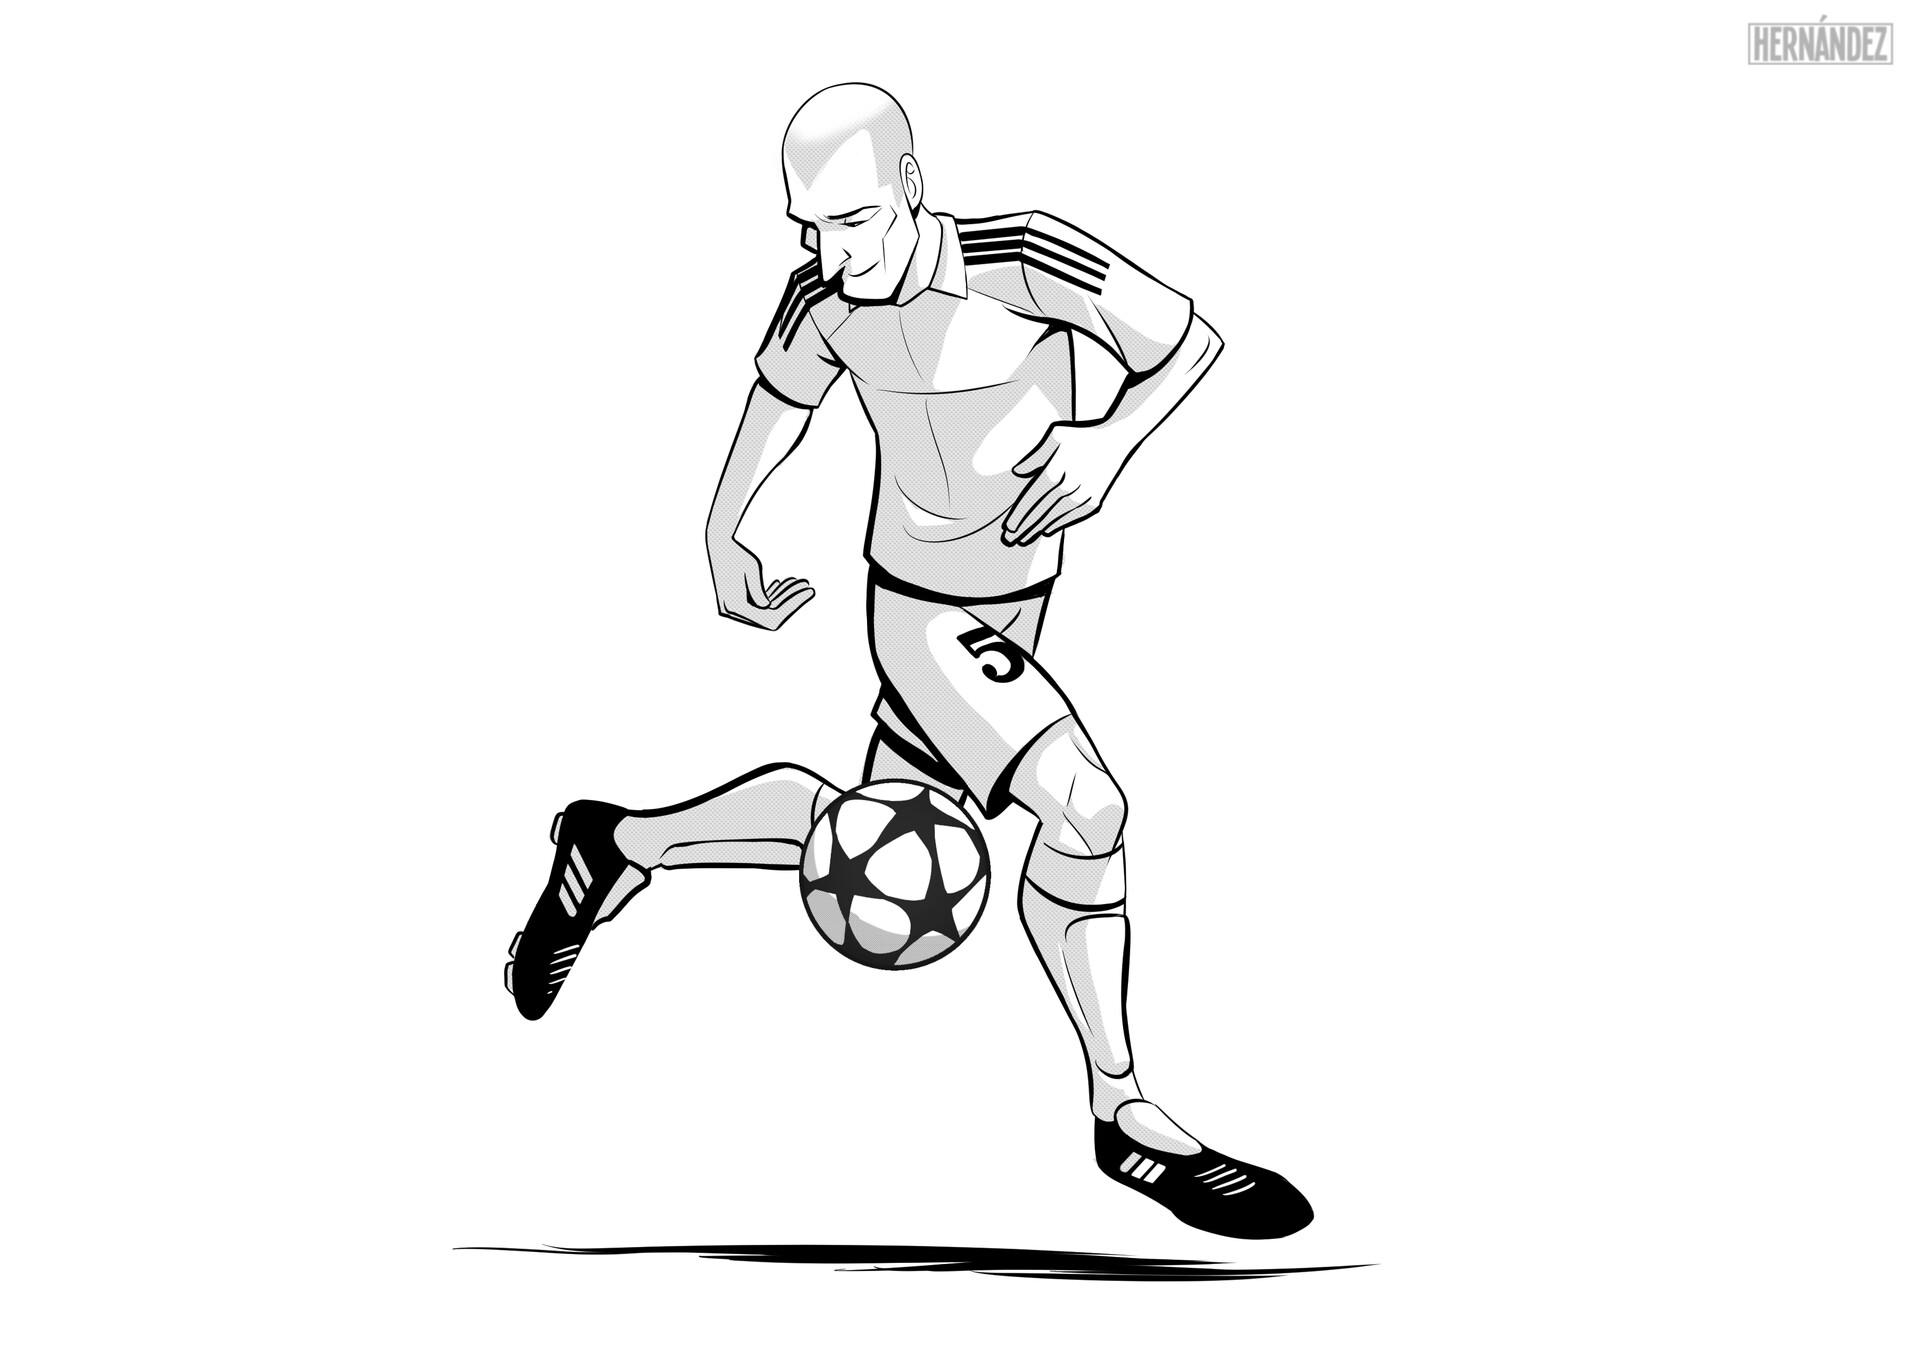 5 Zinedine Zidane